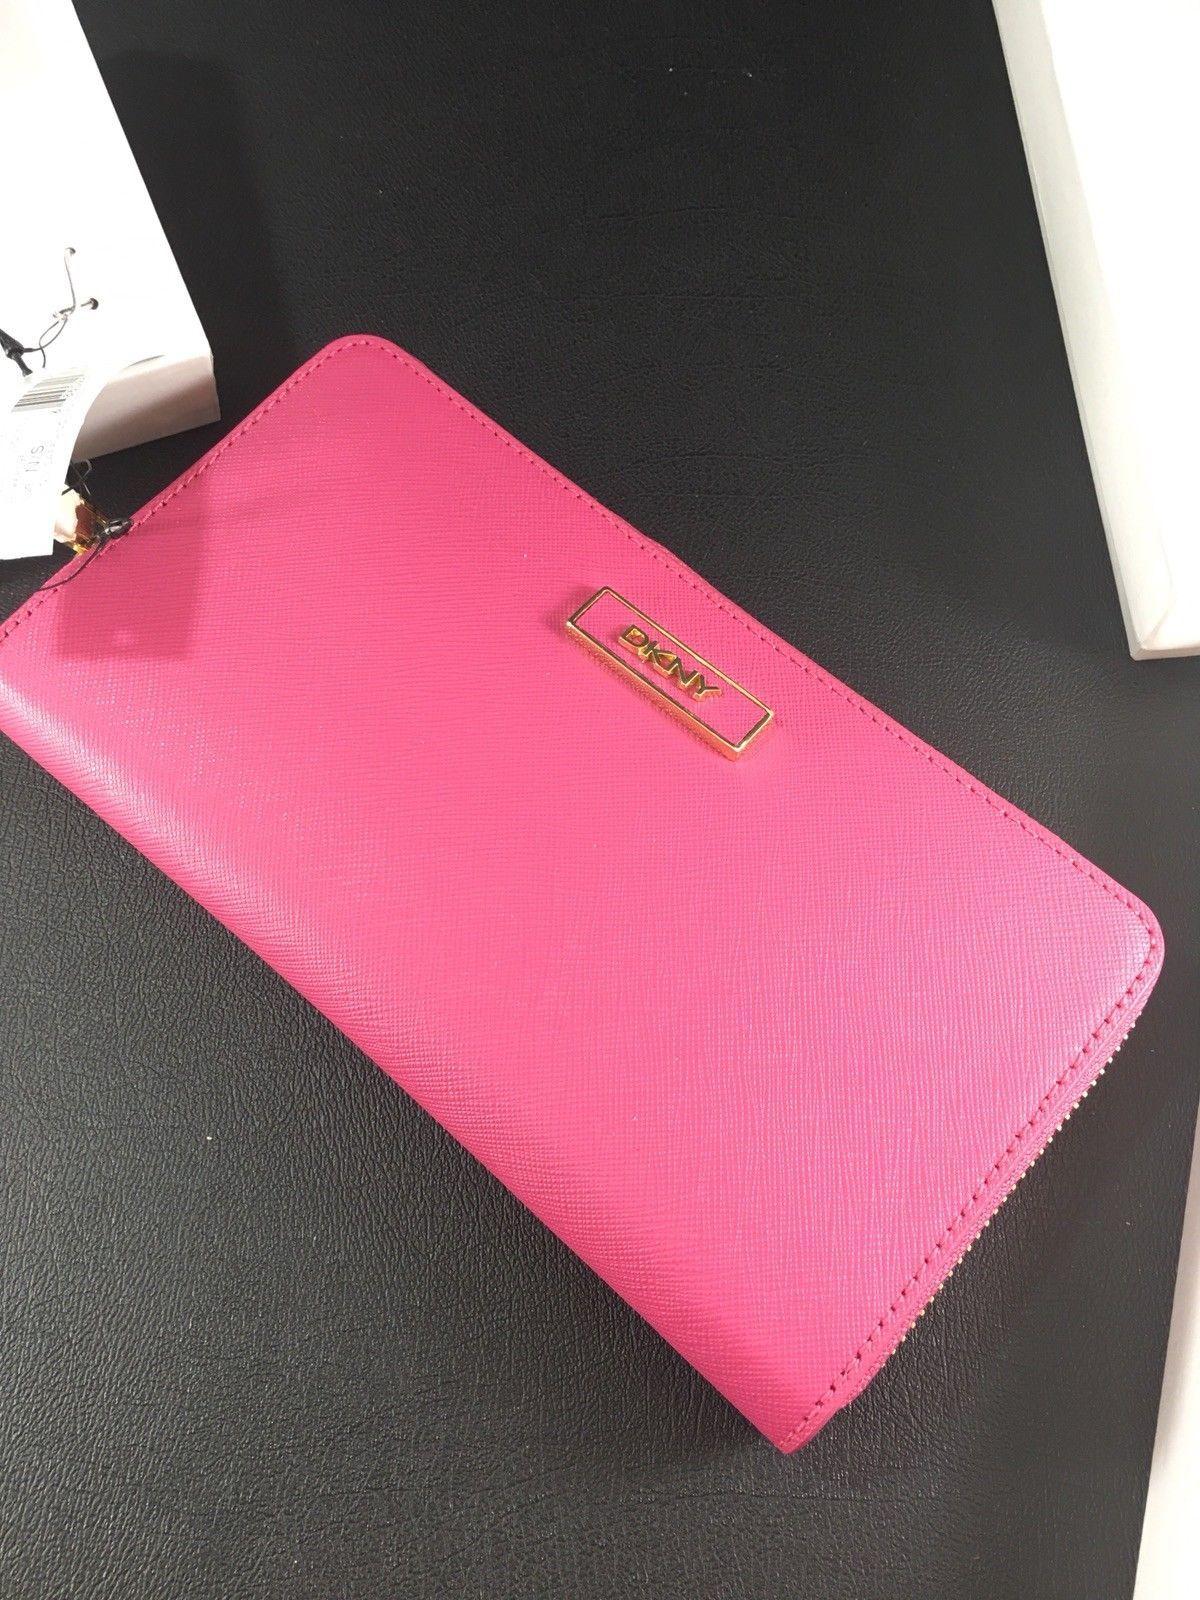 d042daf08 NWT New DKNY Donna Karan Zip Around Wallet and 11 similar items